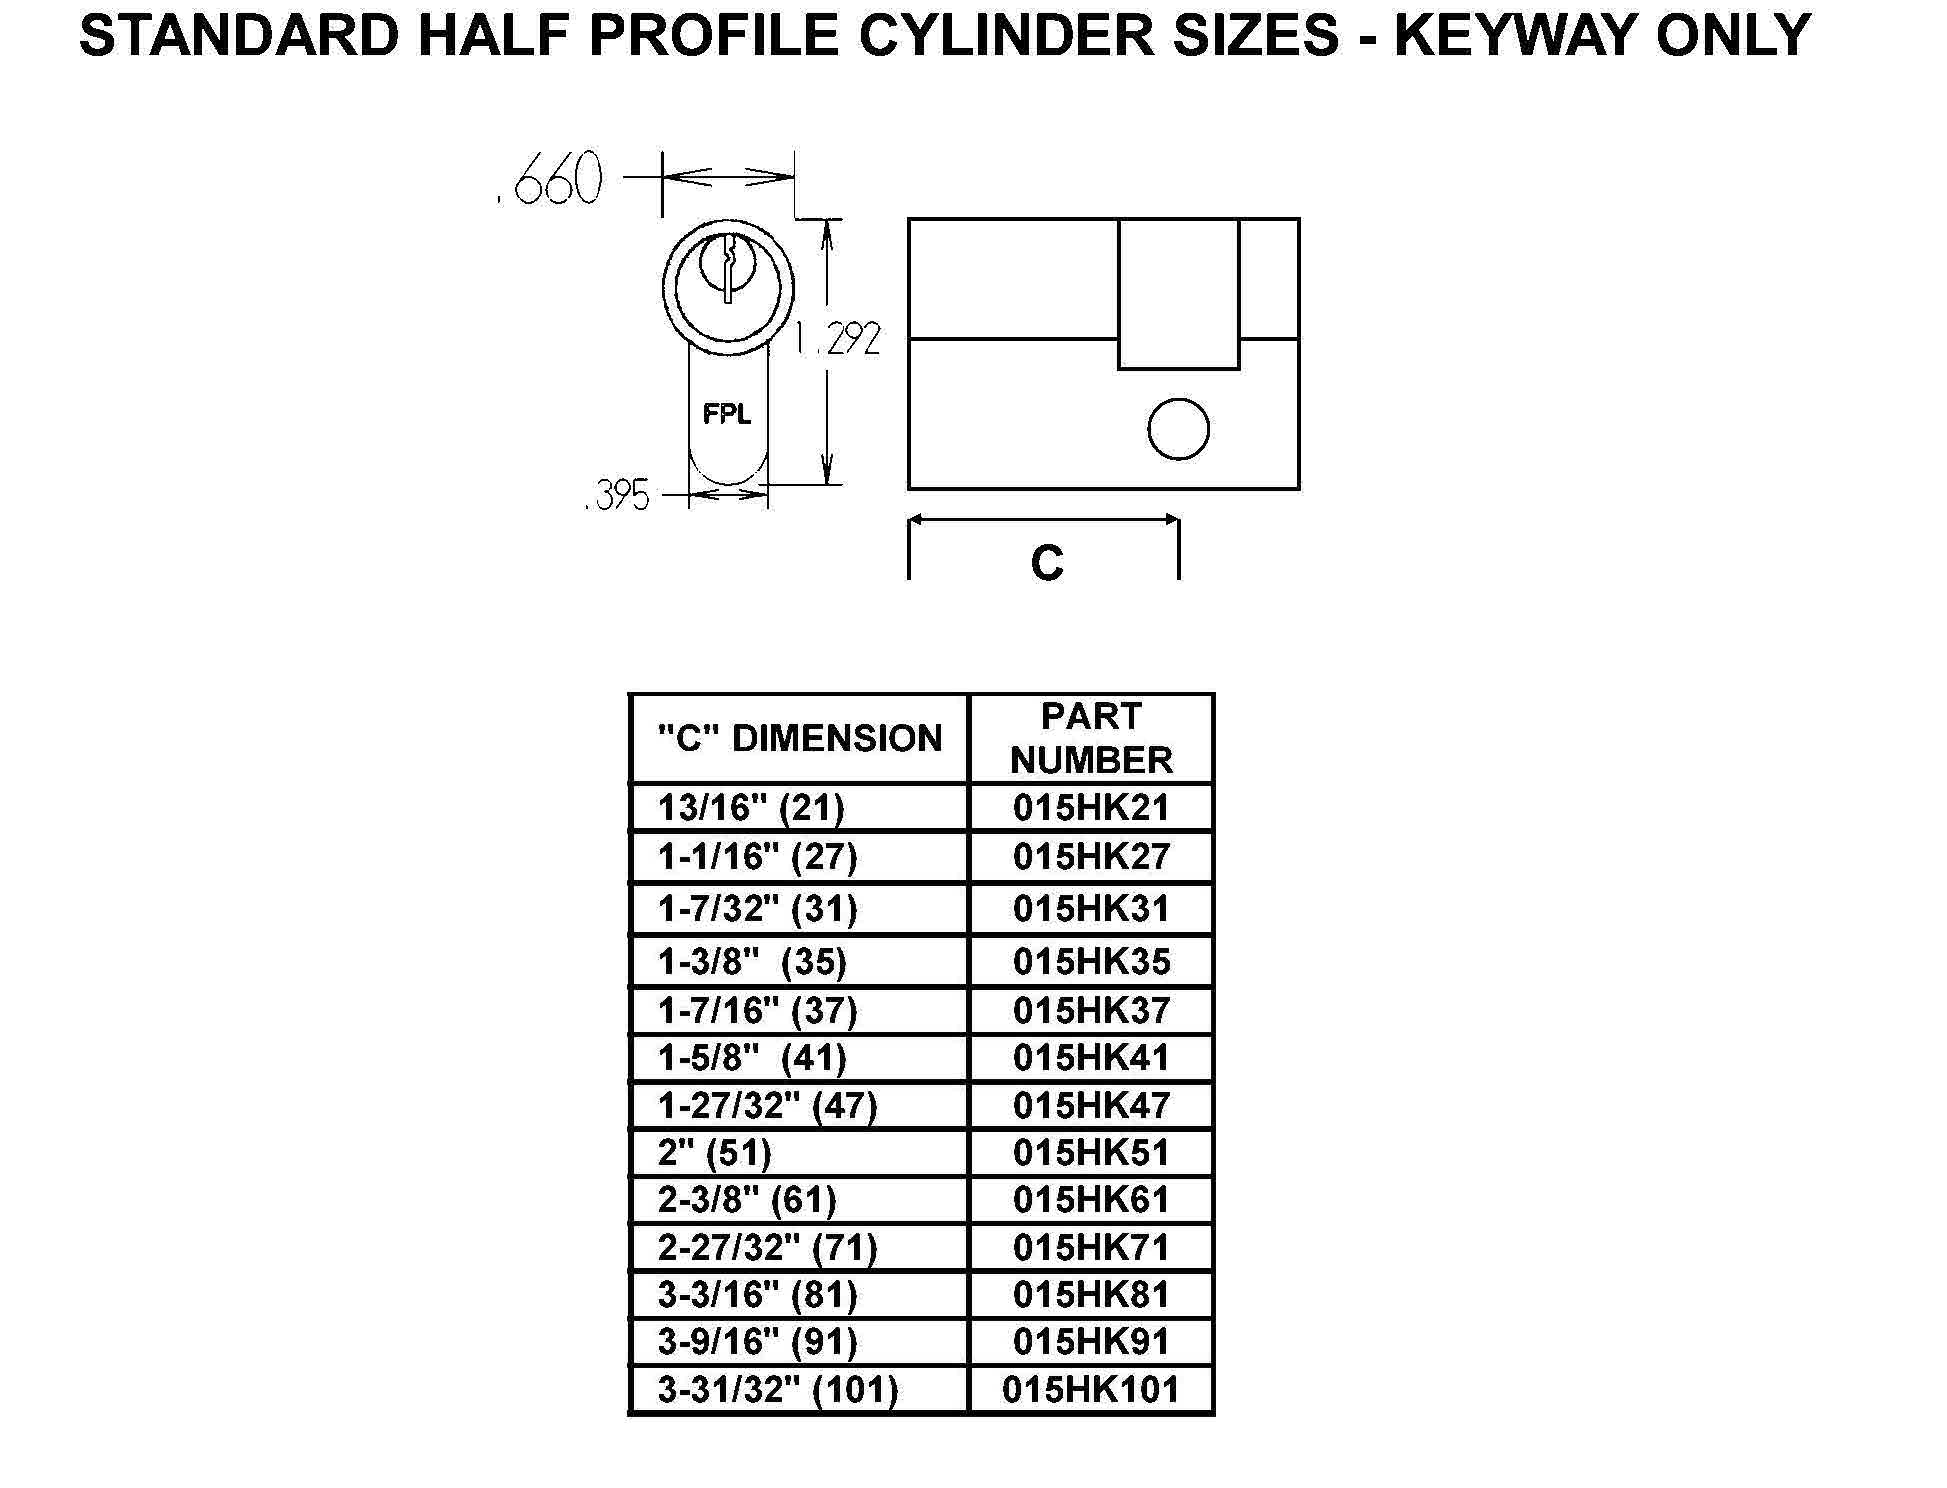 European Profile Cylinders Fpl Door Locks Amp Hardware Inc